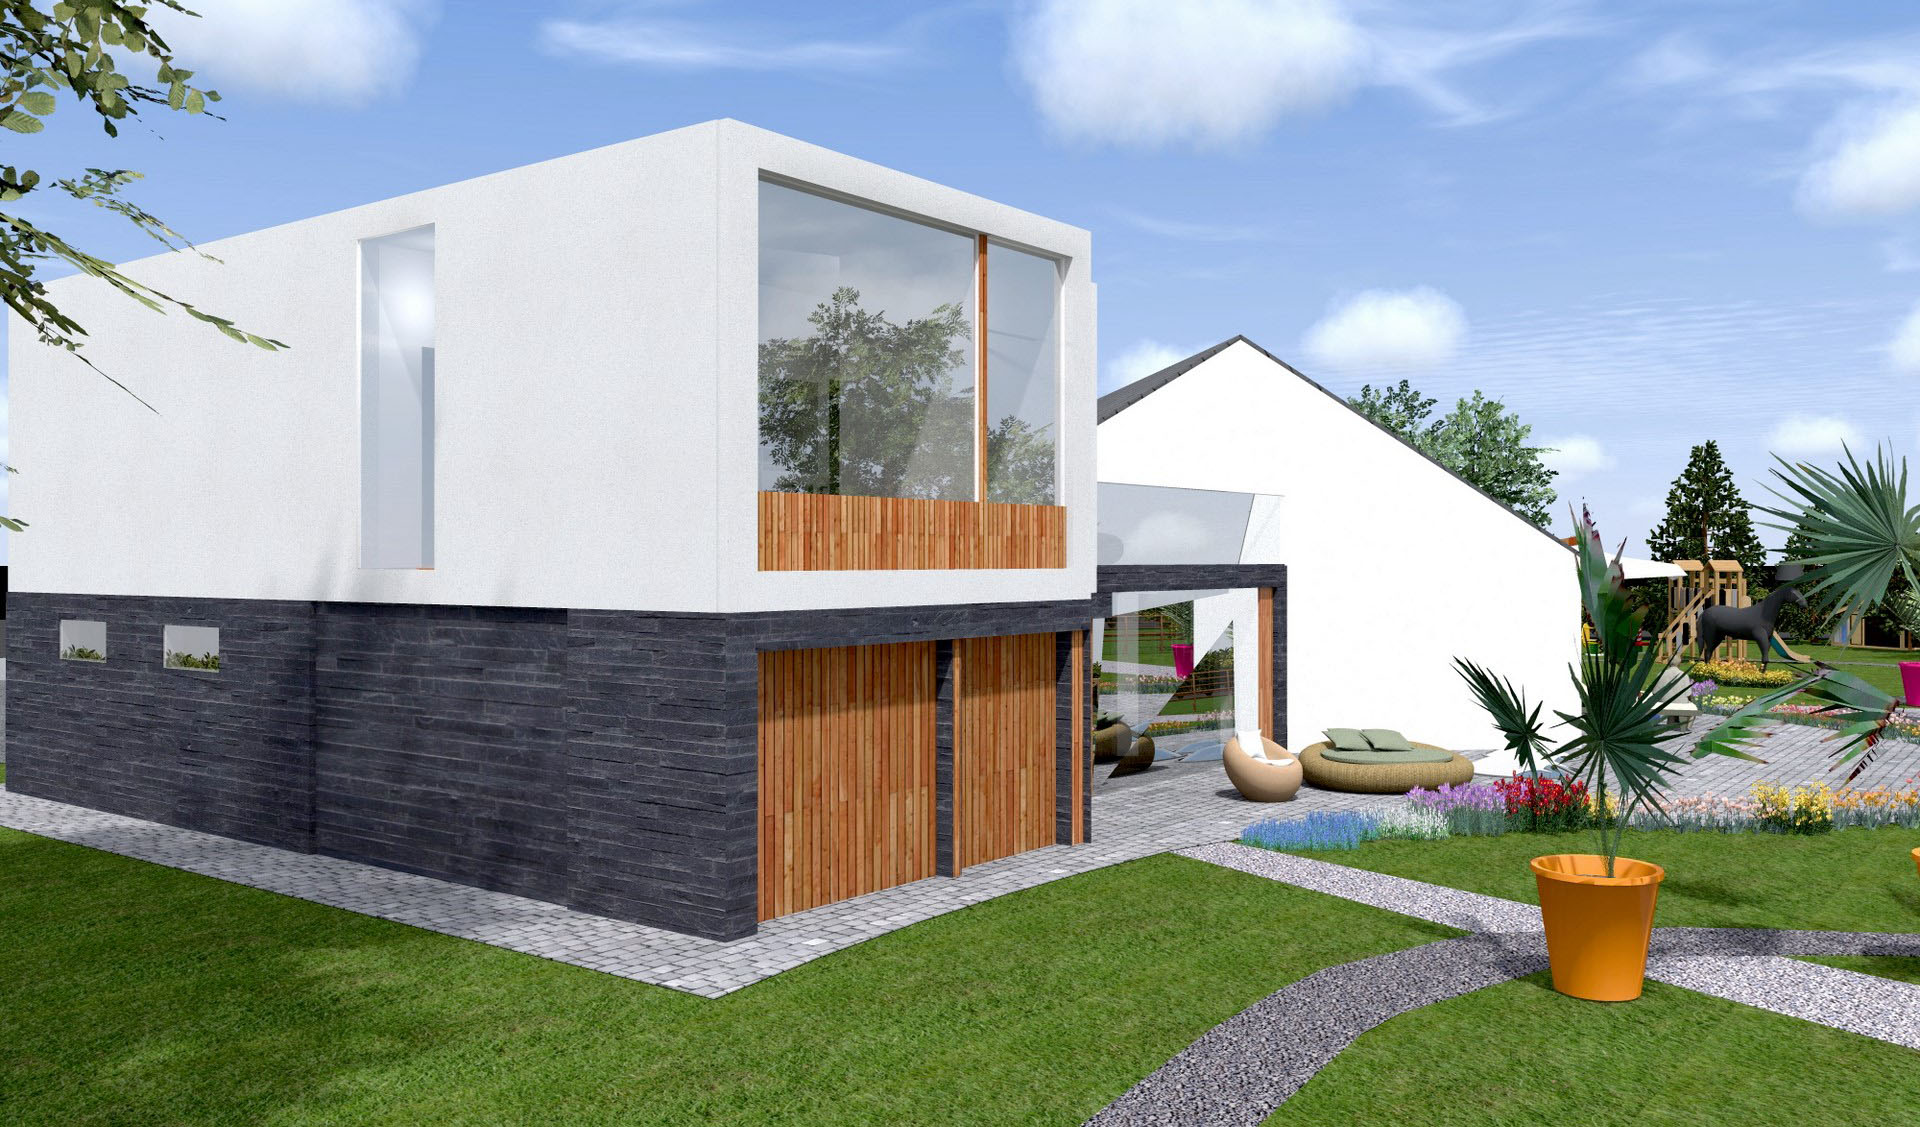 extension toiture terrasse parement pierre prestige bardage bois agence avous